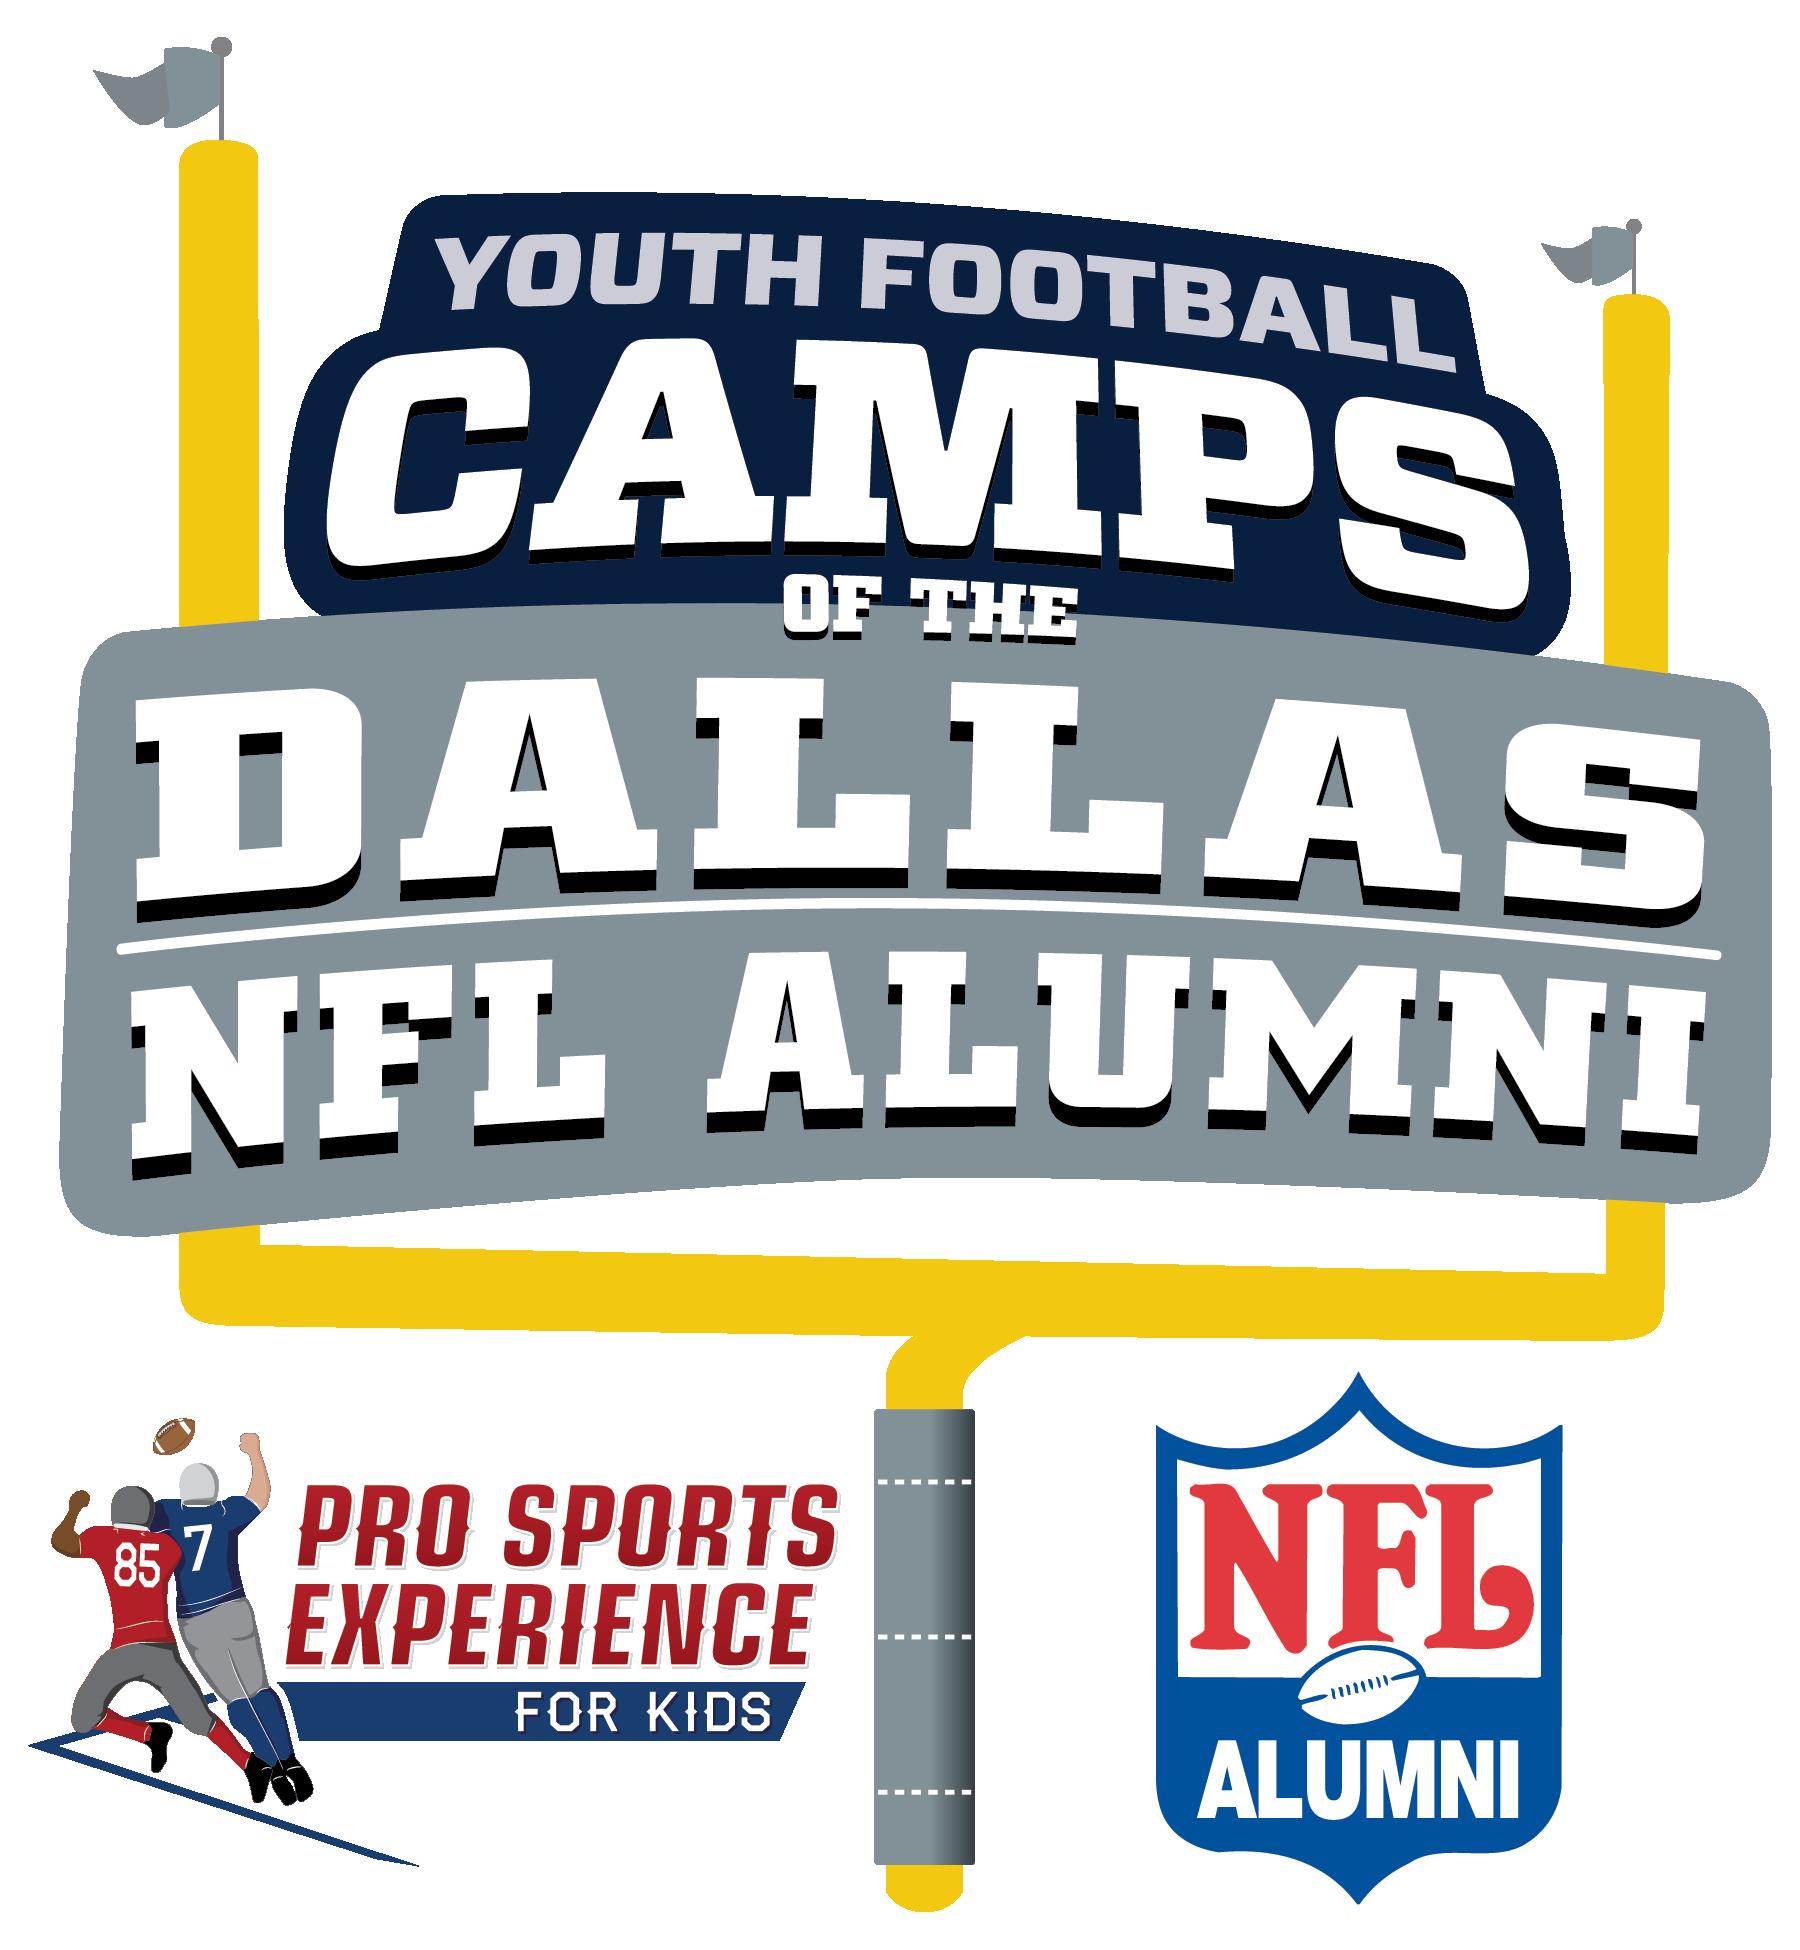 Dallas NFL Alumni Hero Youth Football Camps - Richardson